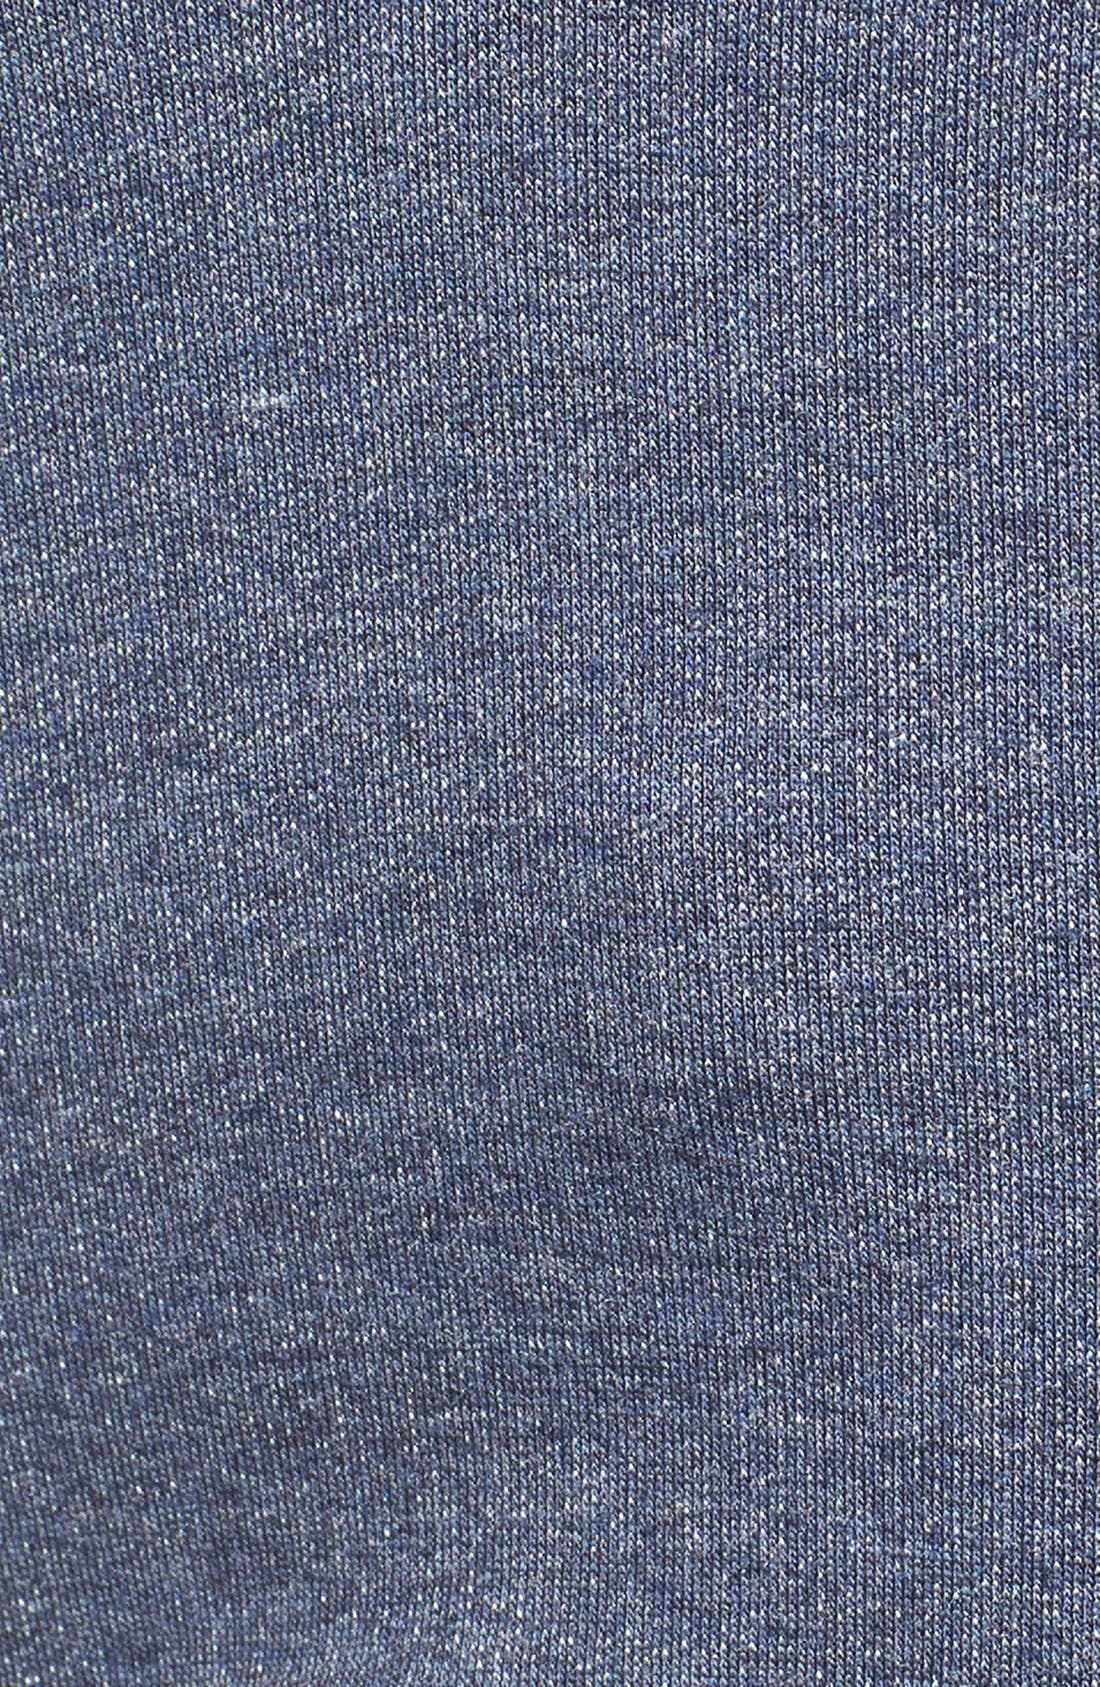 Presley Body-Con Maternity Dress,                             Alternate thumbnail 3, color,                             Blue Denim